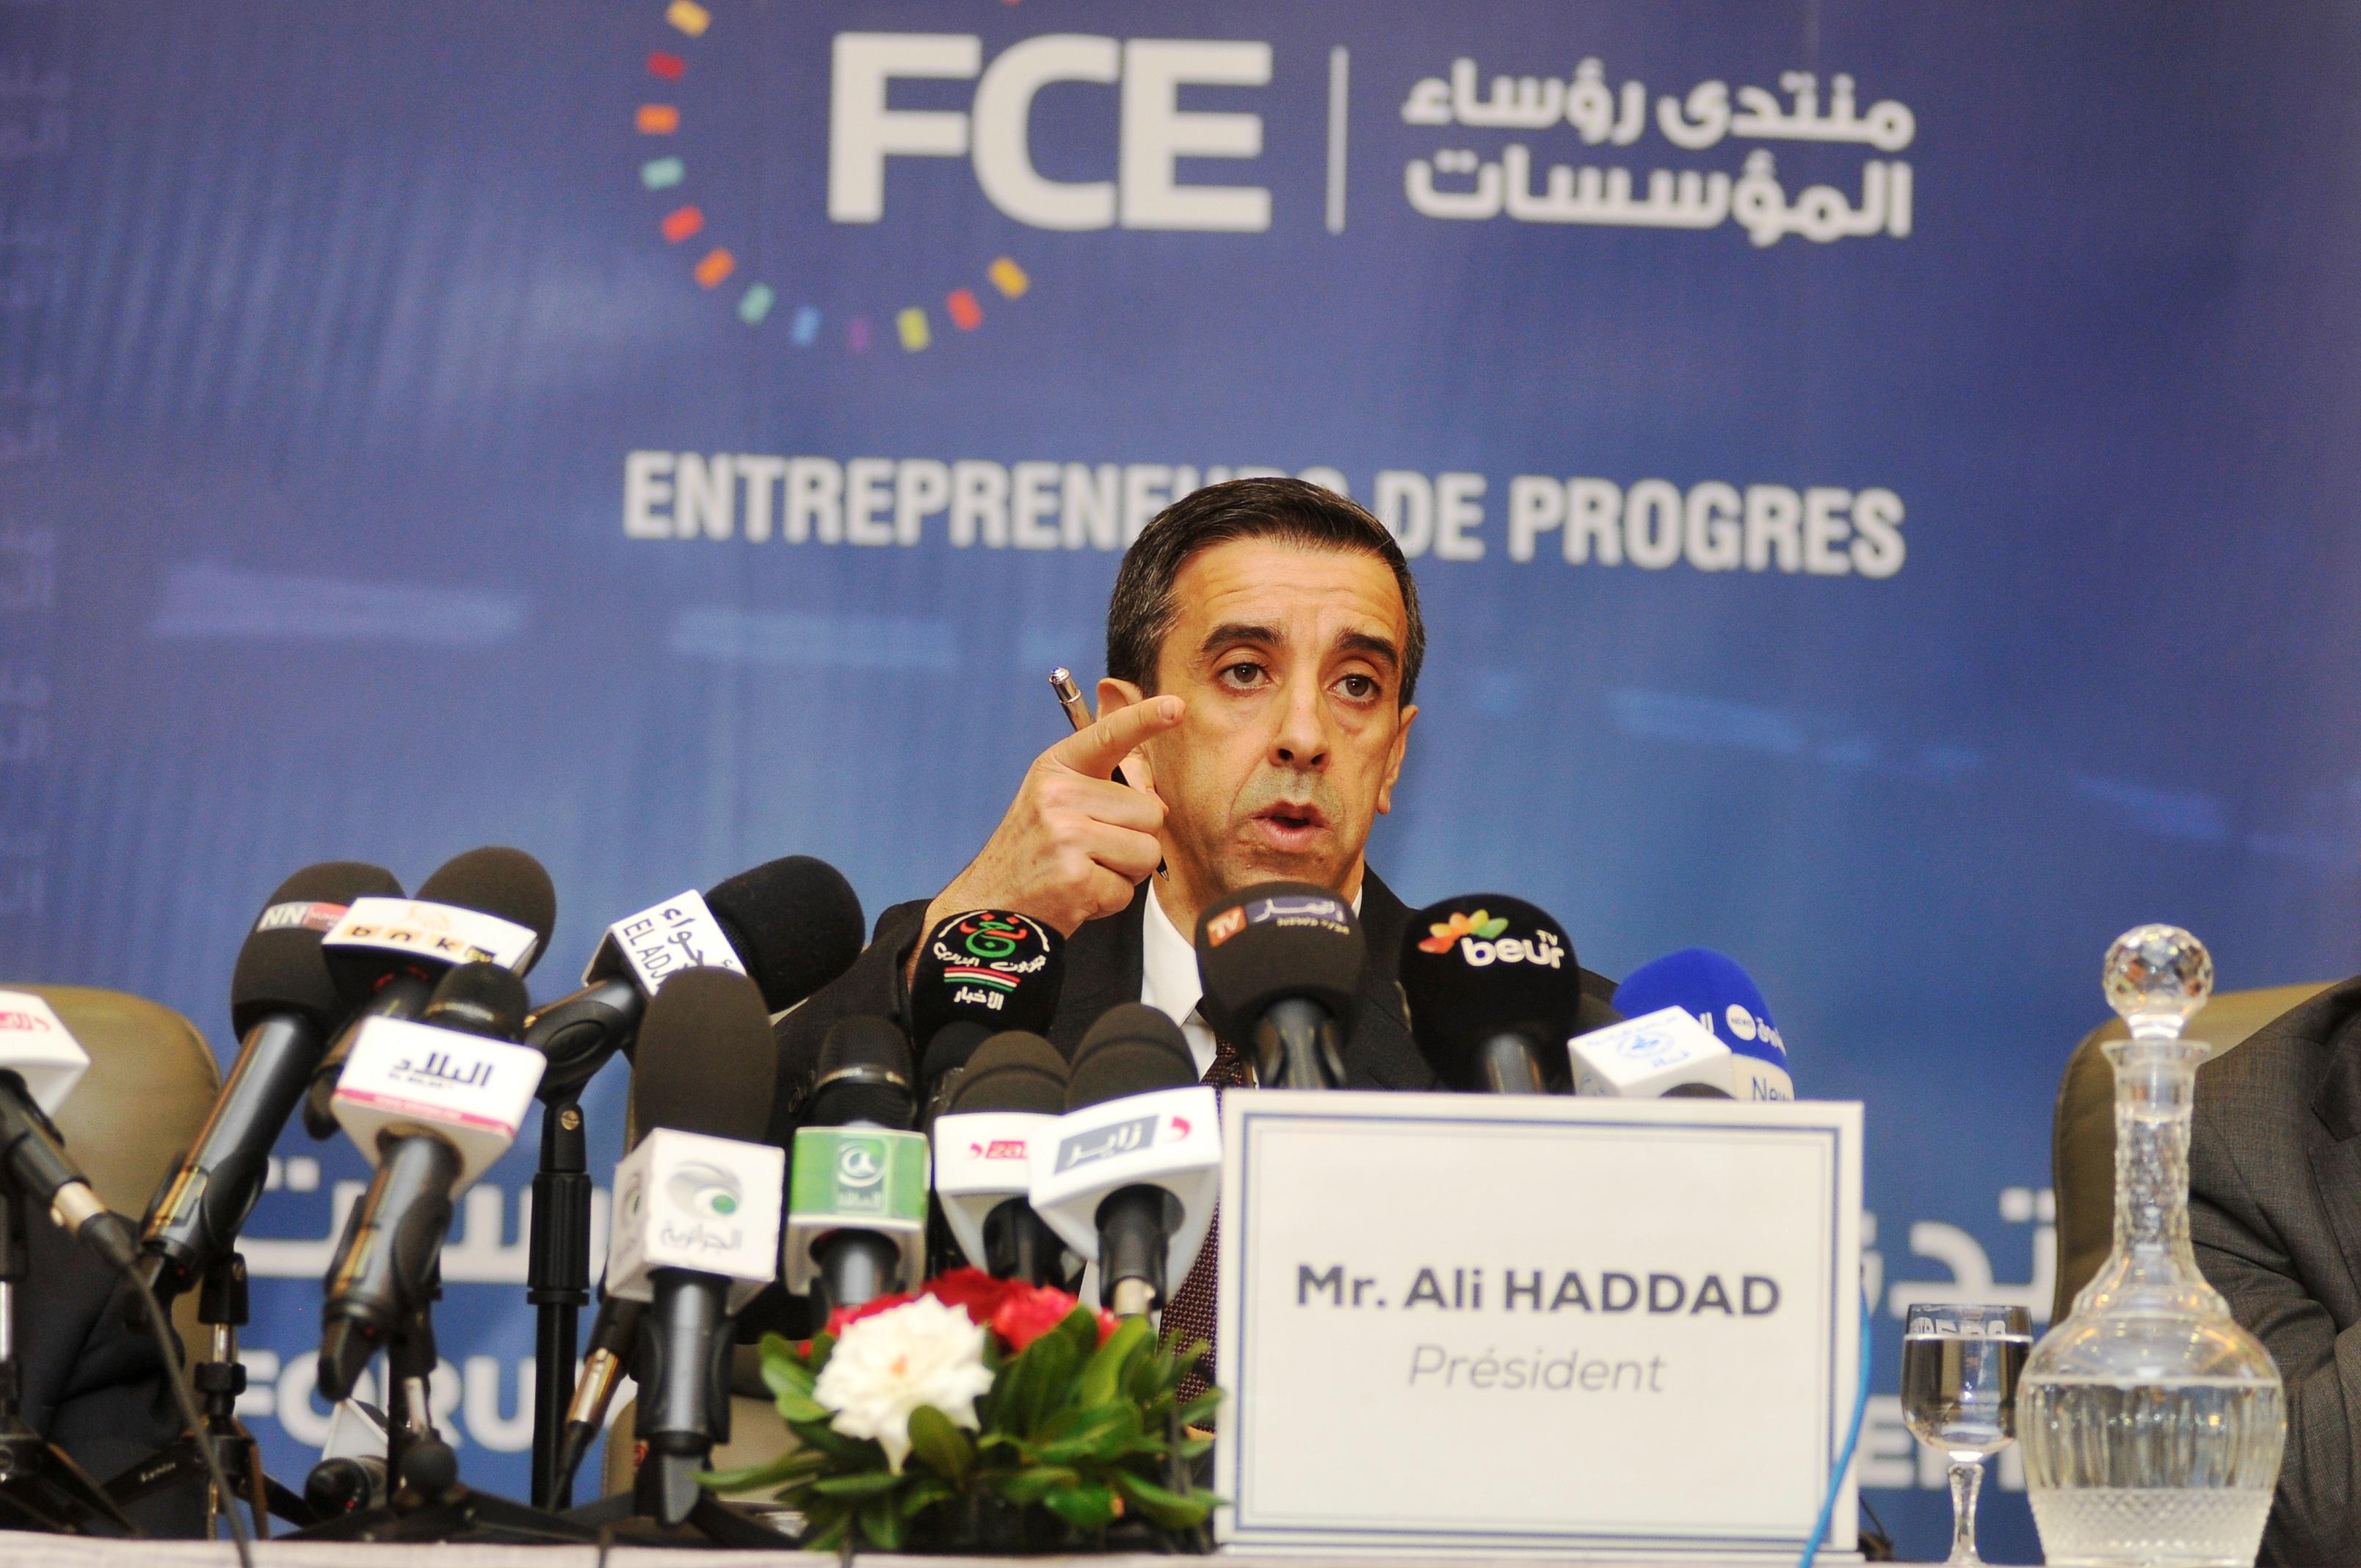 DIA-haddad FCE